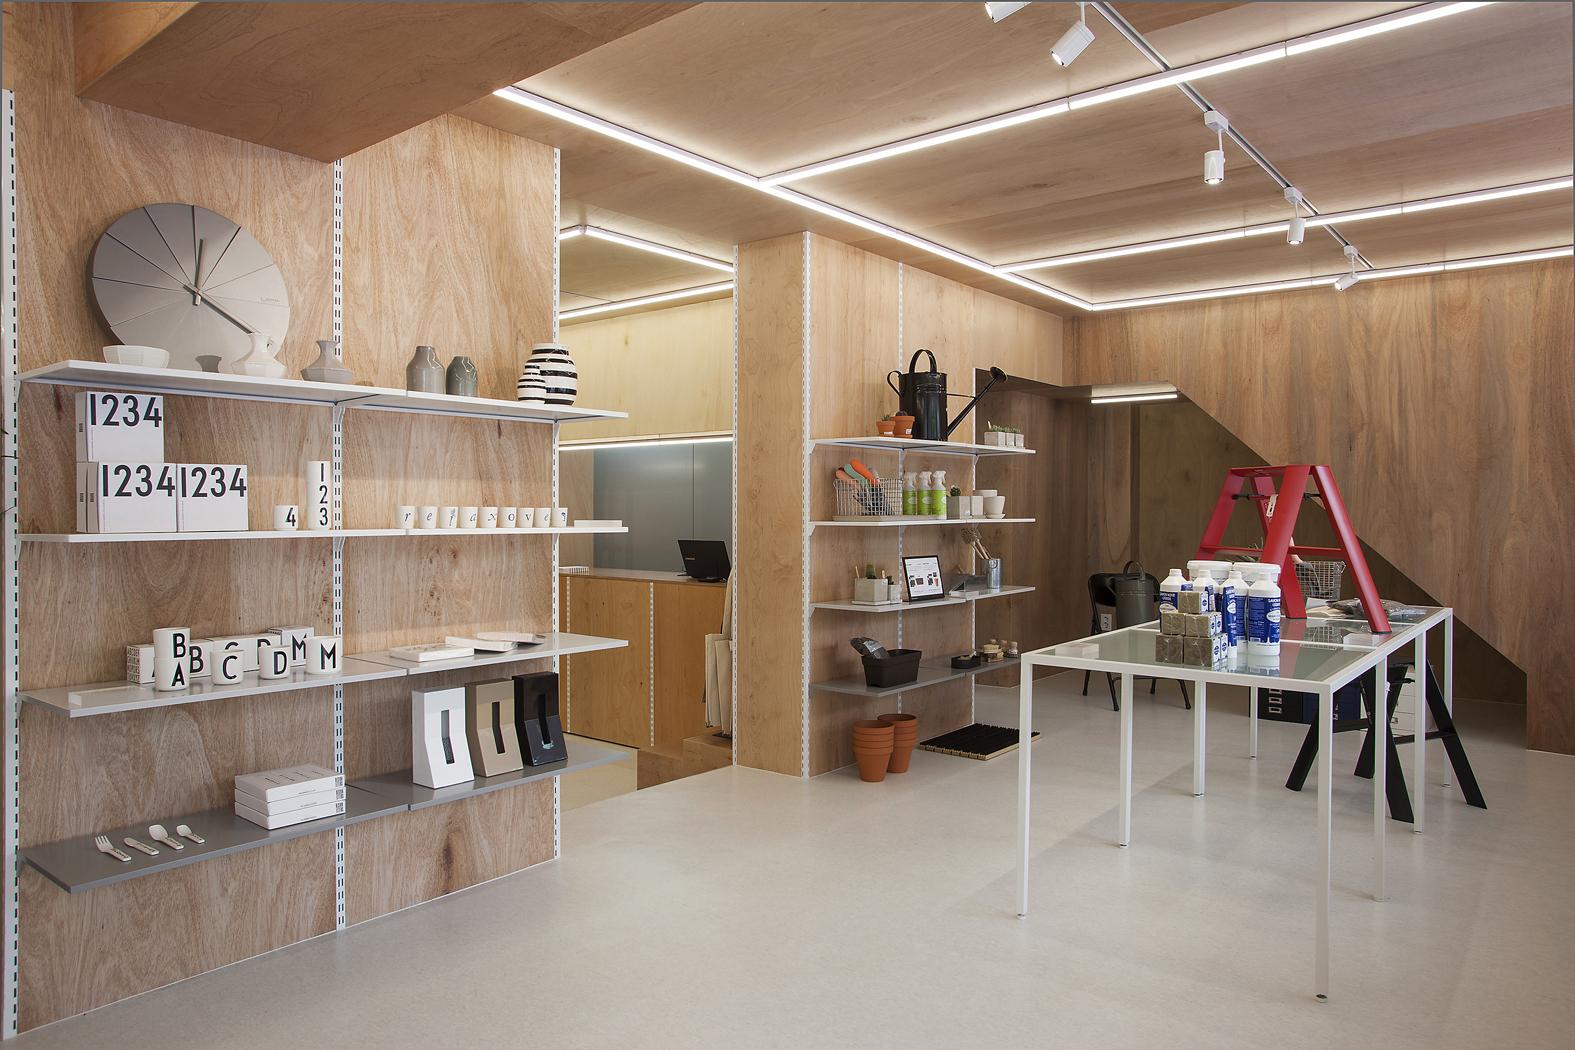 PLATFORM PLACE HANNAM Store_Interior (1)